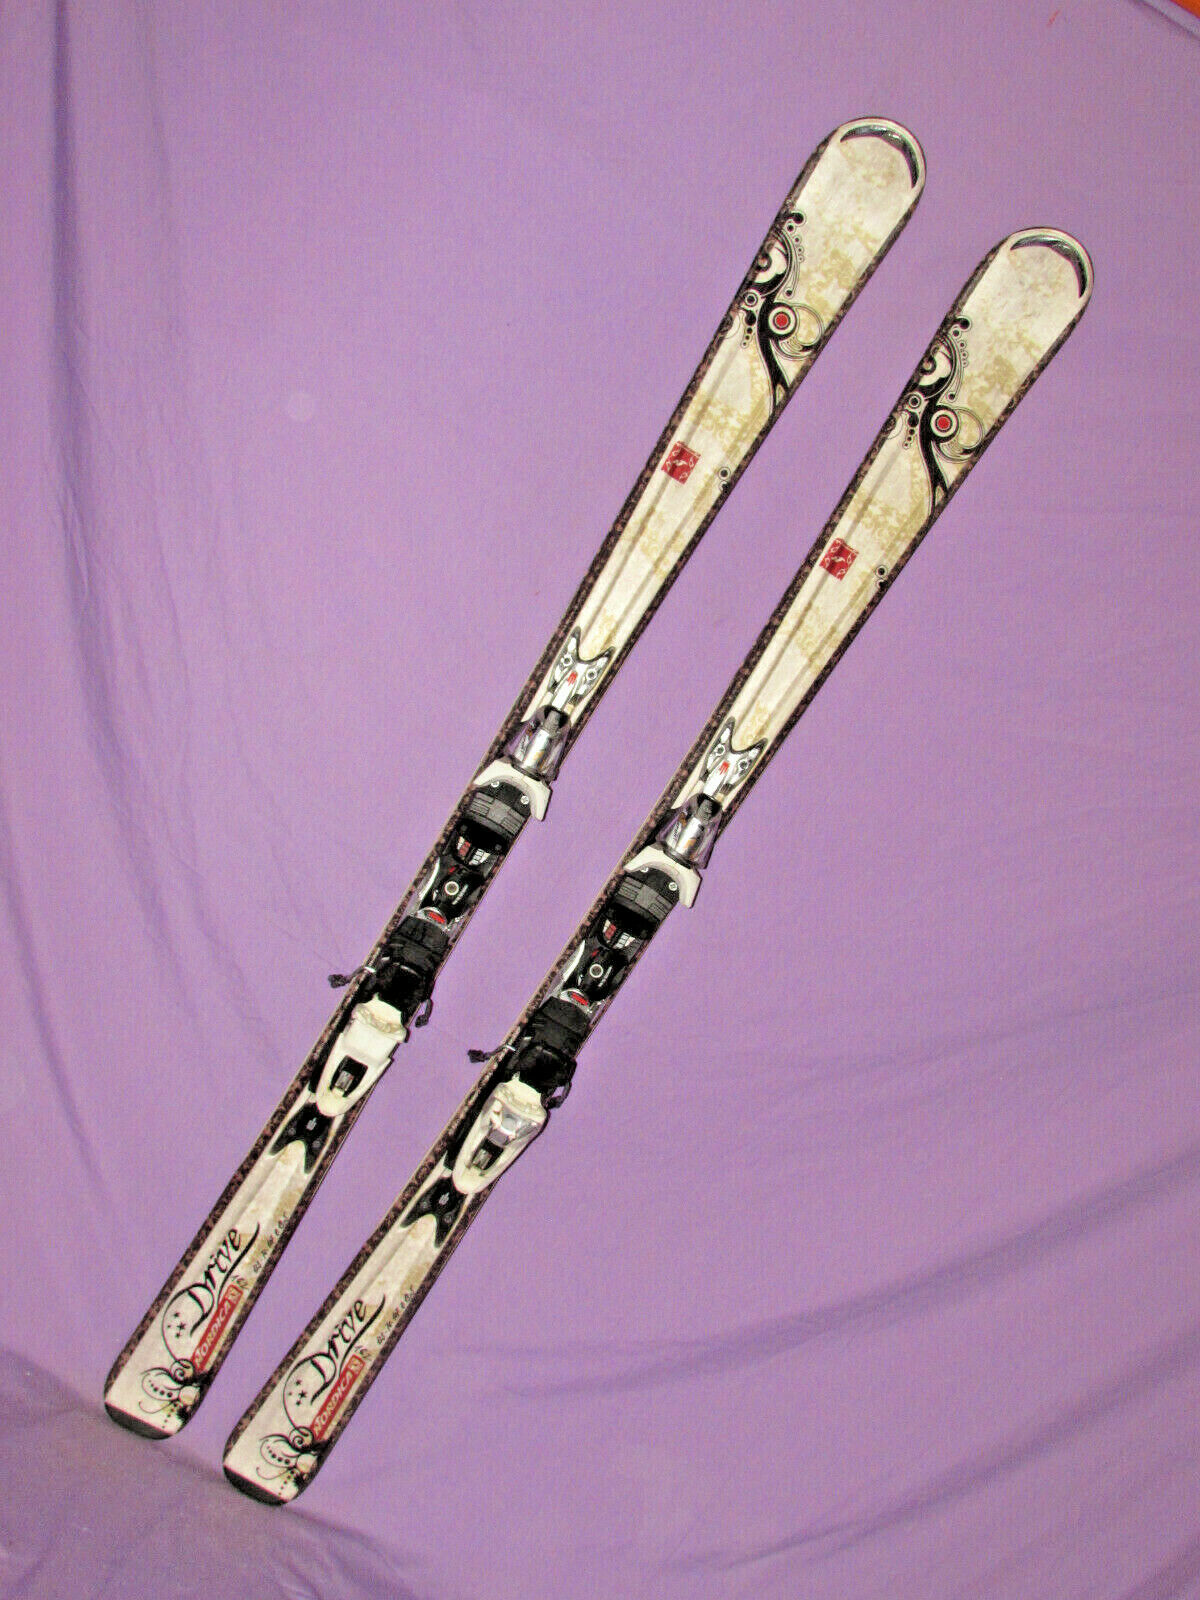 Nordica DRIVE women's skis 162cm w   Nordica N Sport XBi CT adjustable bindings   online